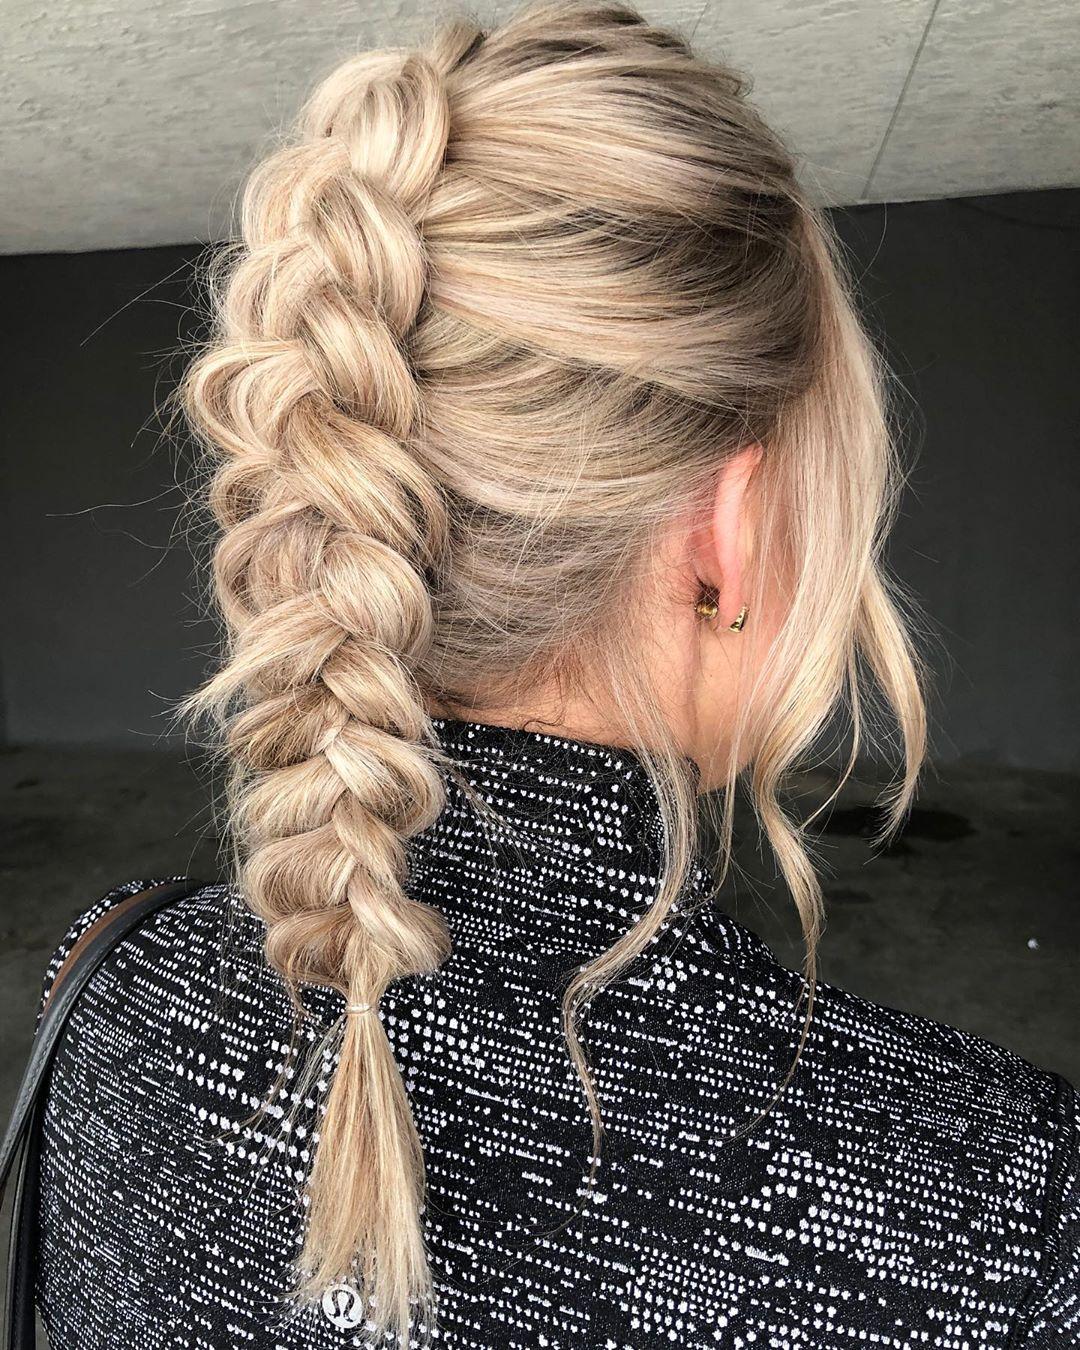 Viking ponytail in boho braid style